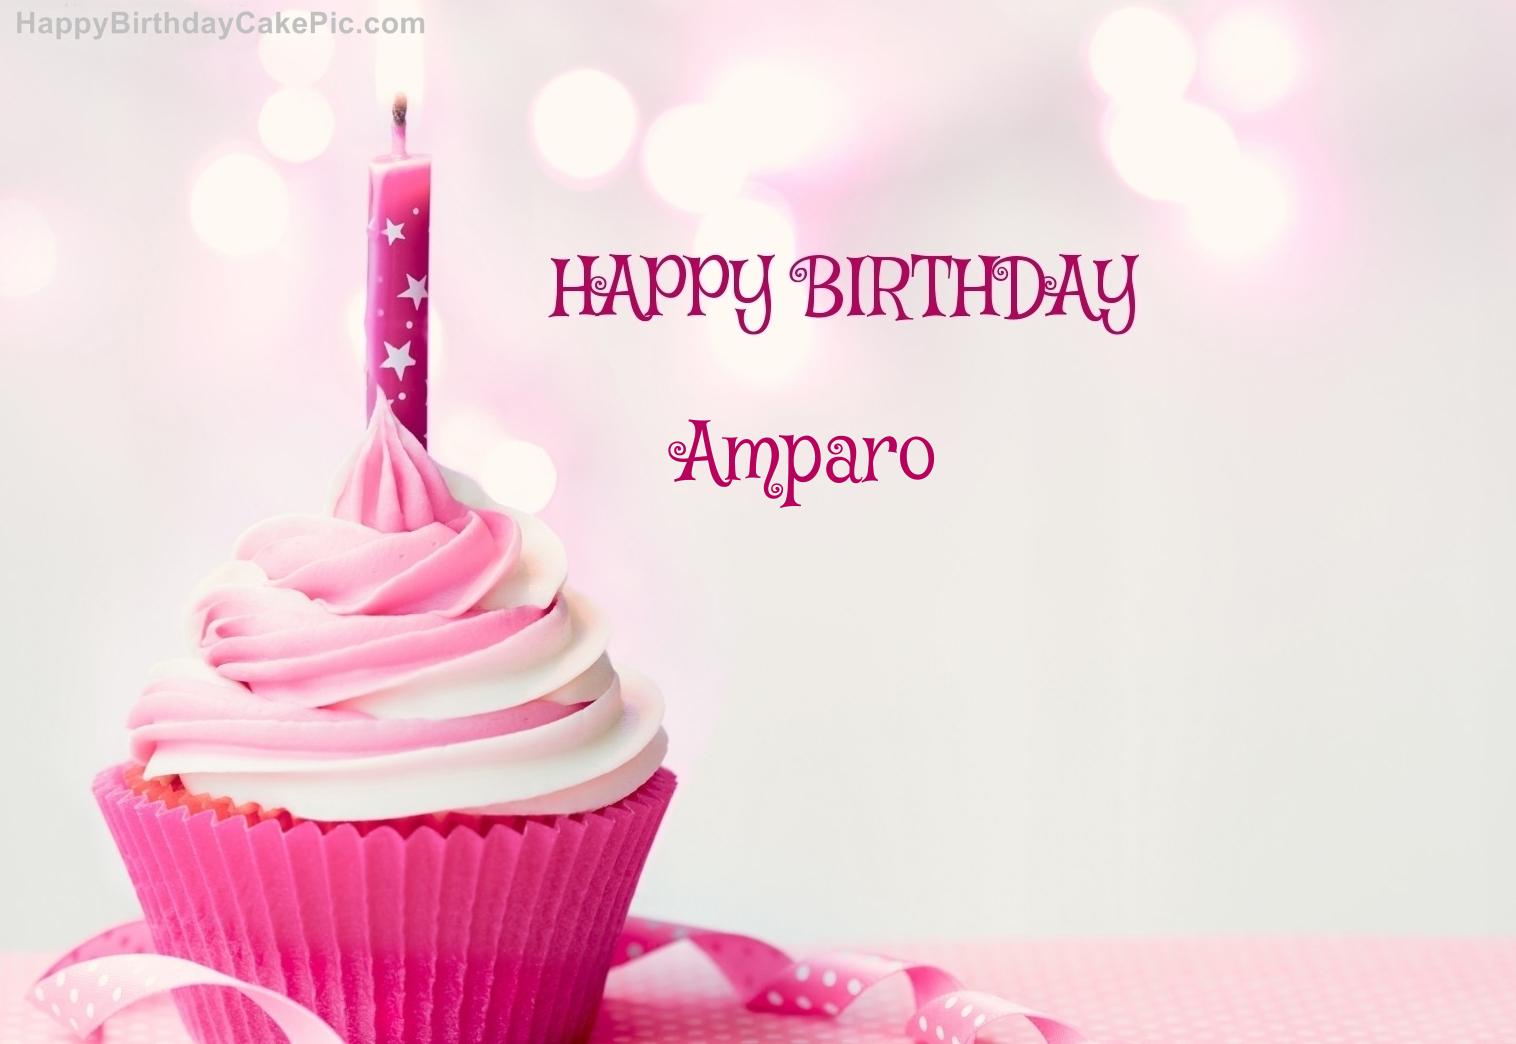 write name on Happy Birthday Cupcake Candle Pink Cake